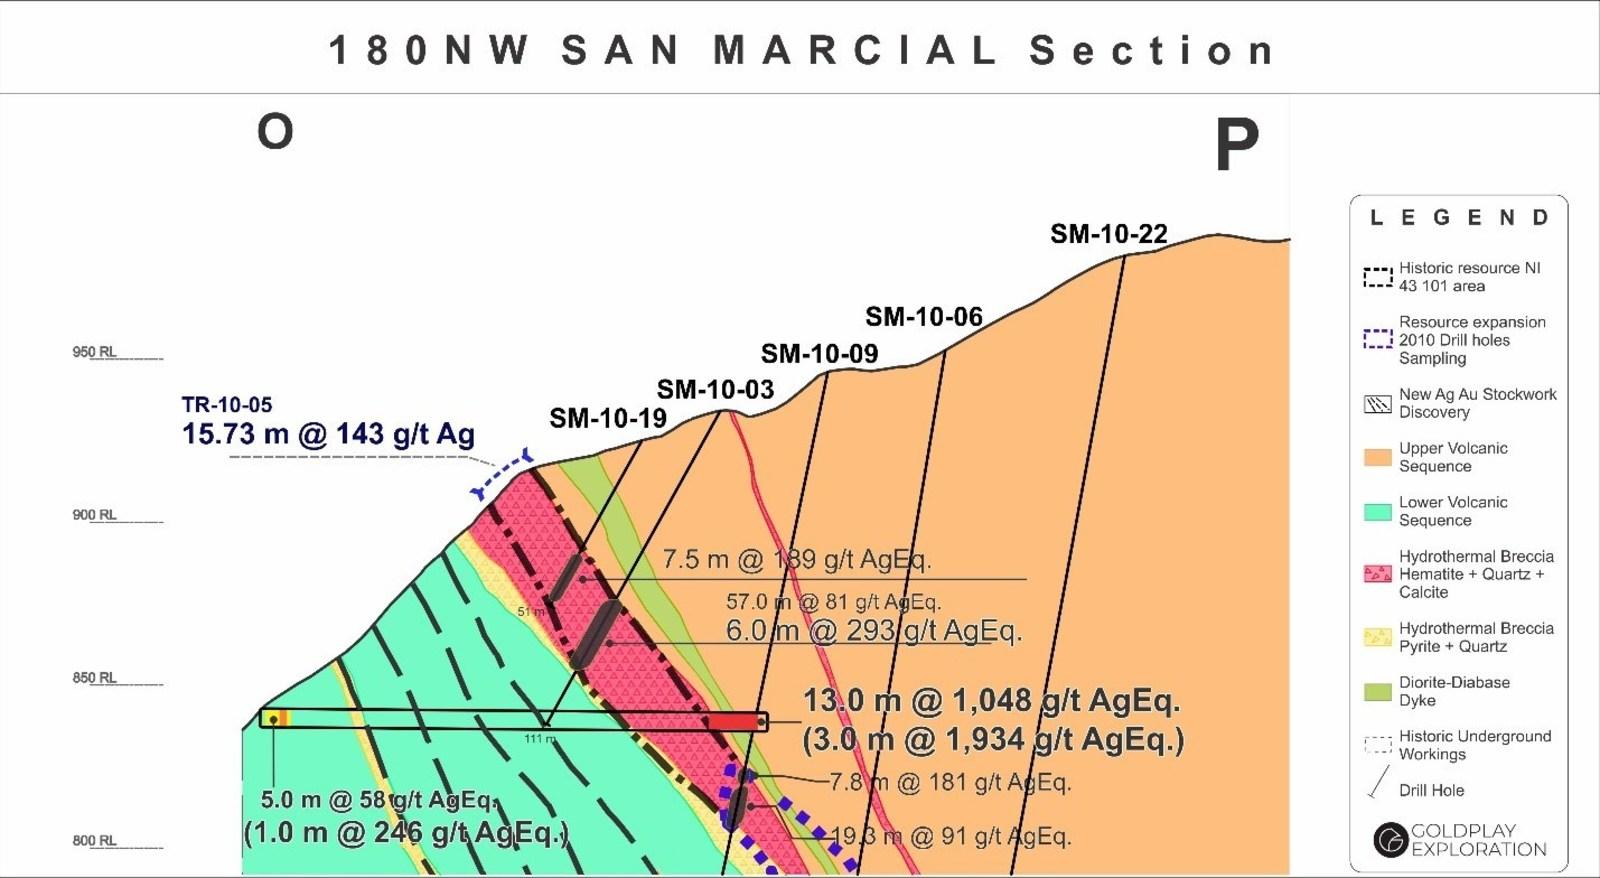 Figure 2: San Marcial Cross Section O-P